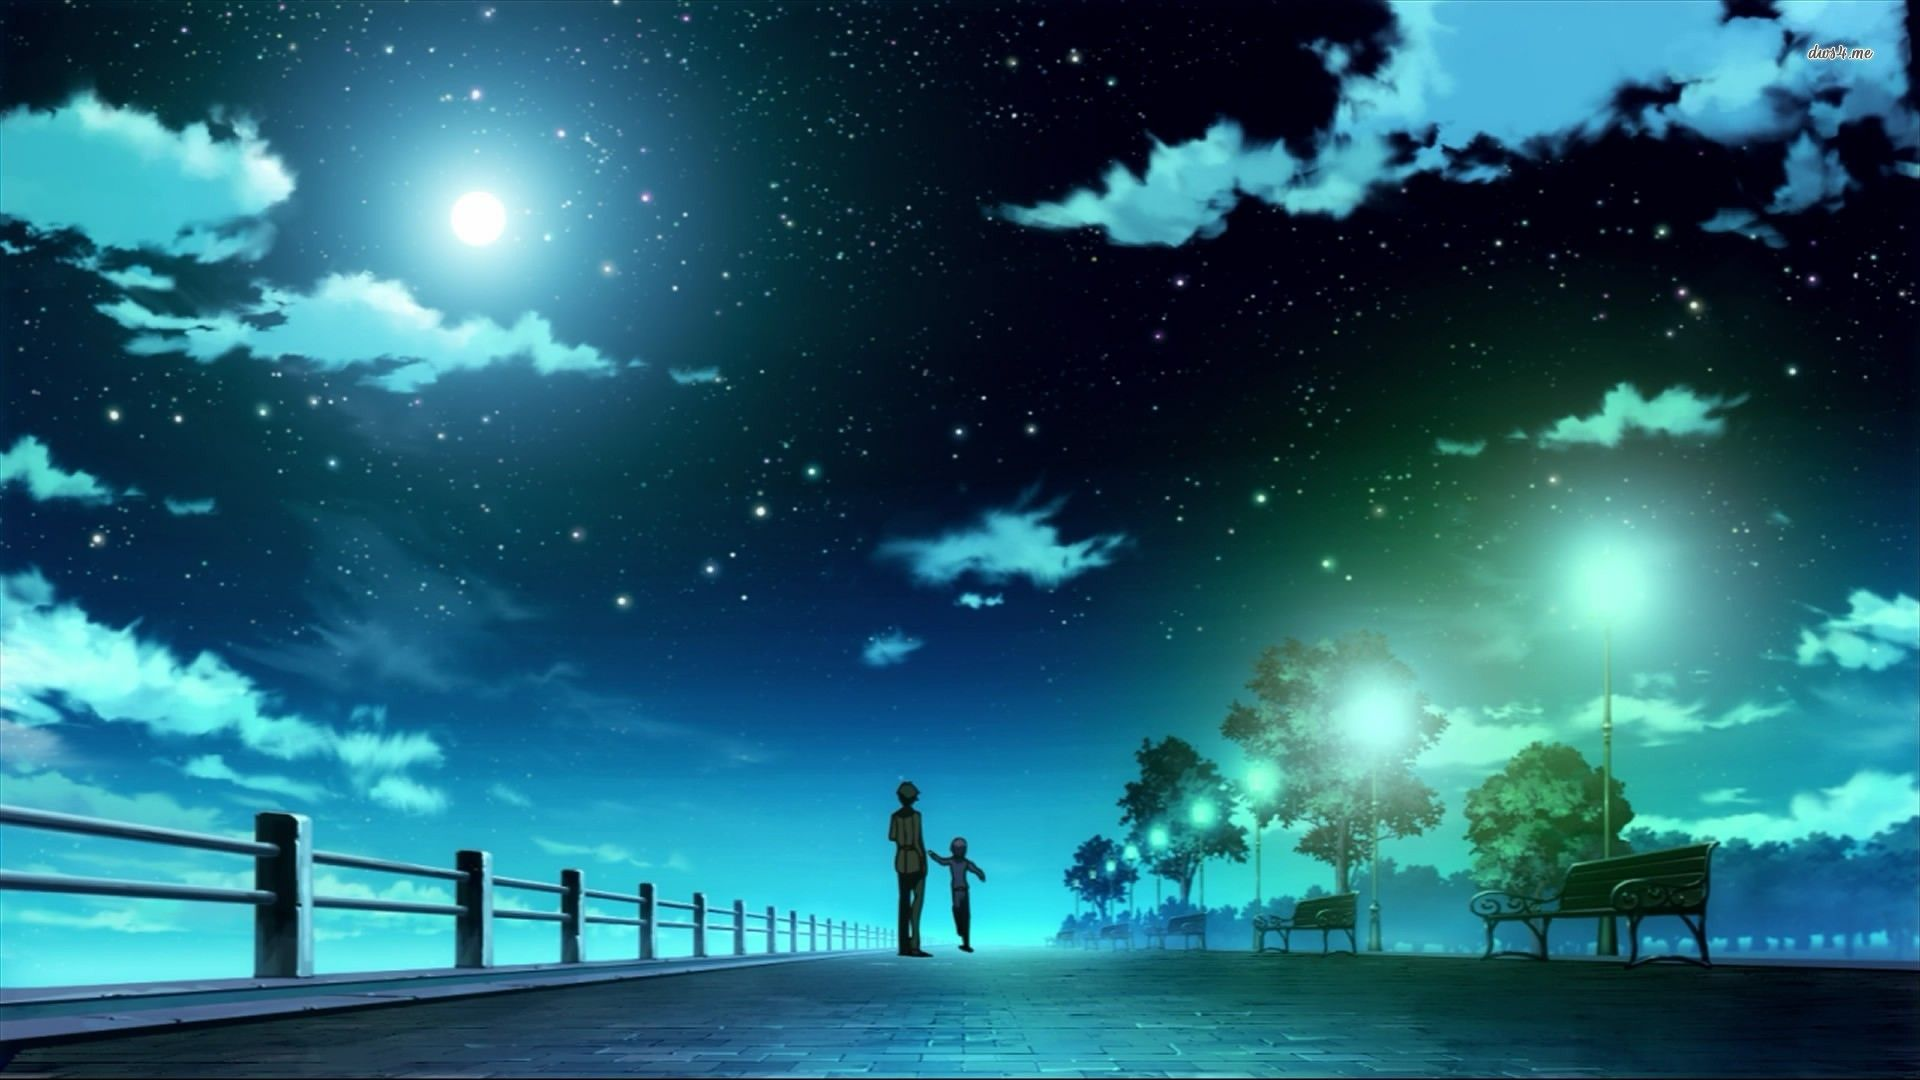 Hd wallpaper cool aesthetic anime art anime guy anime boy Aesthetic Anime Desktop Wallpapers - Top Free Aesthetic ...